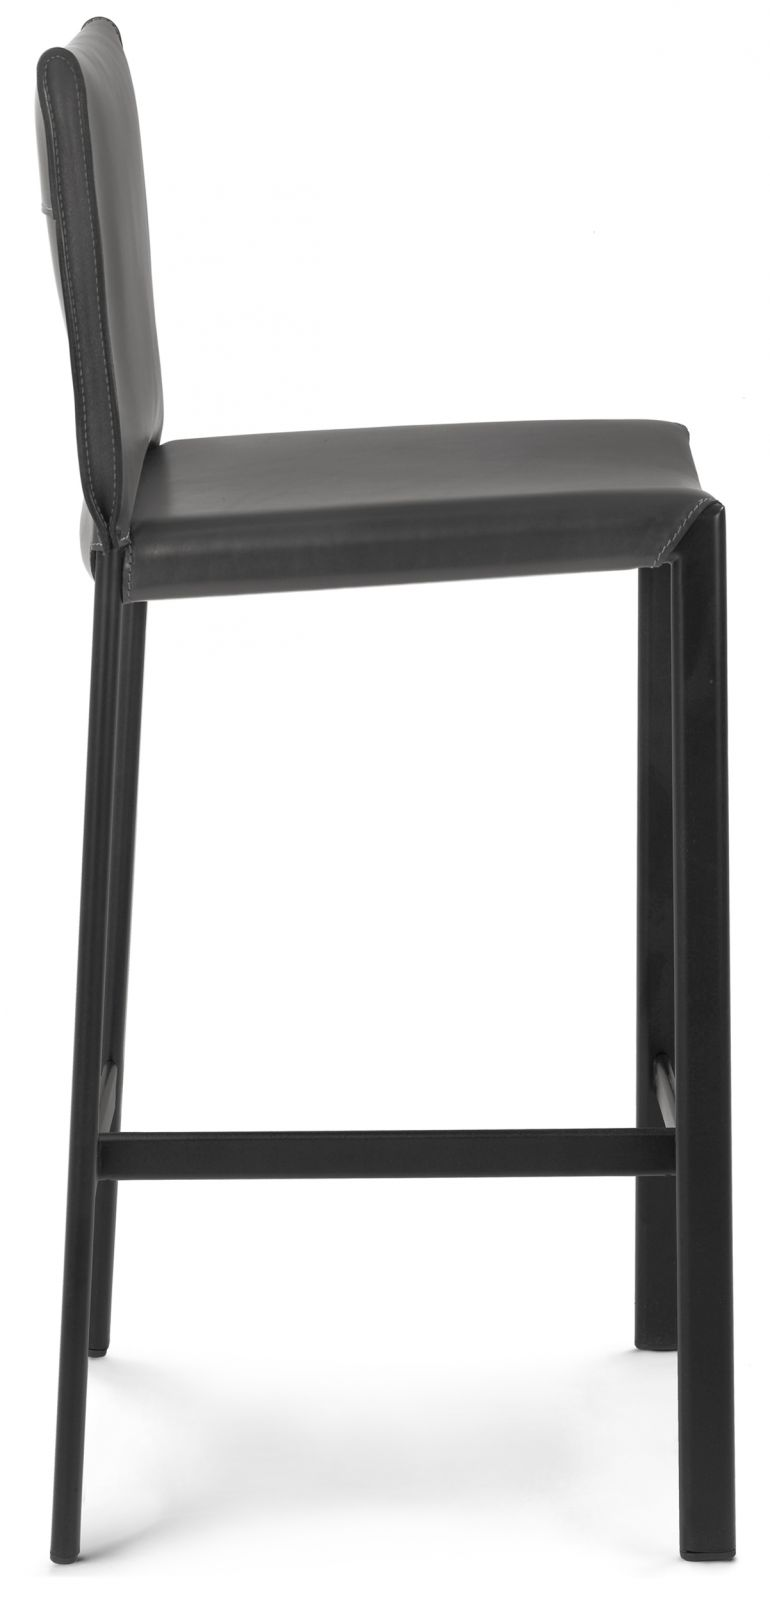 modern-bar-stools-Italian-furniture-large (39).jpg